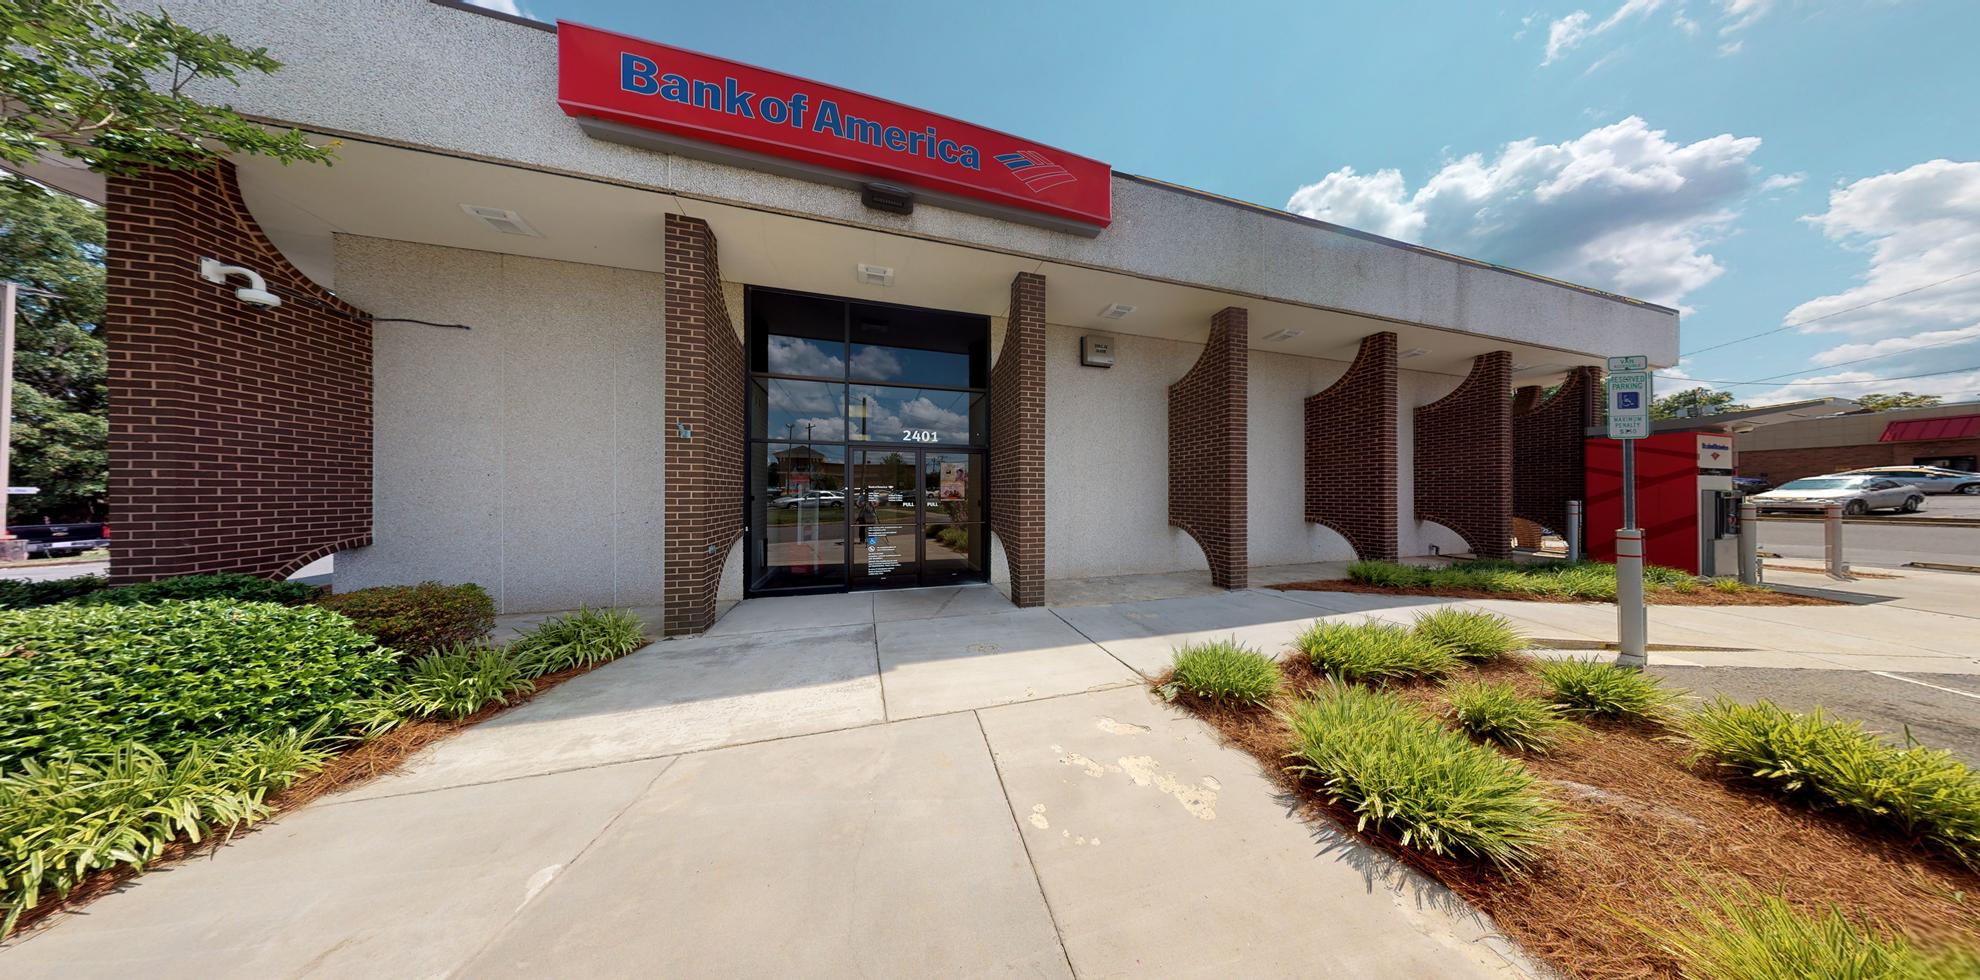 Bank of America financial center with drive-thru ATM   2401 W Franklin Blvd, Gastonia, NC 28052